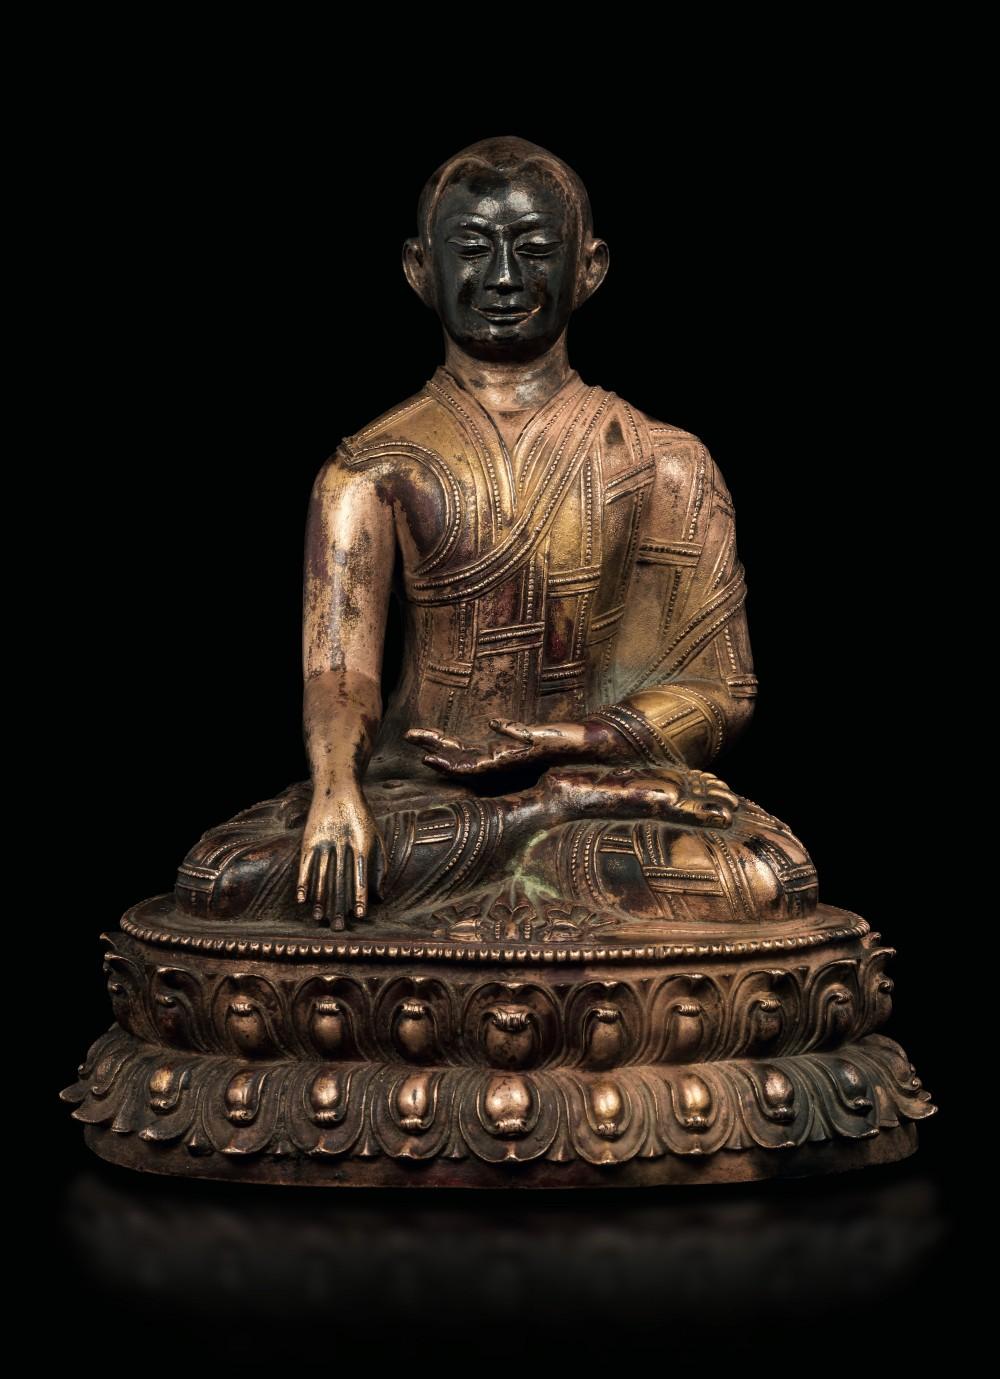 Figurin i brons, Lama sittande i en lotusblomma. Tibet 1200-tal. Bild: Cambi.